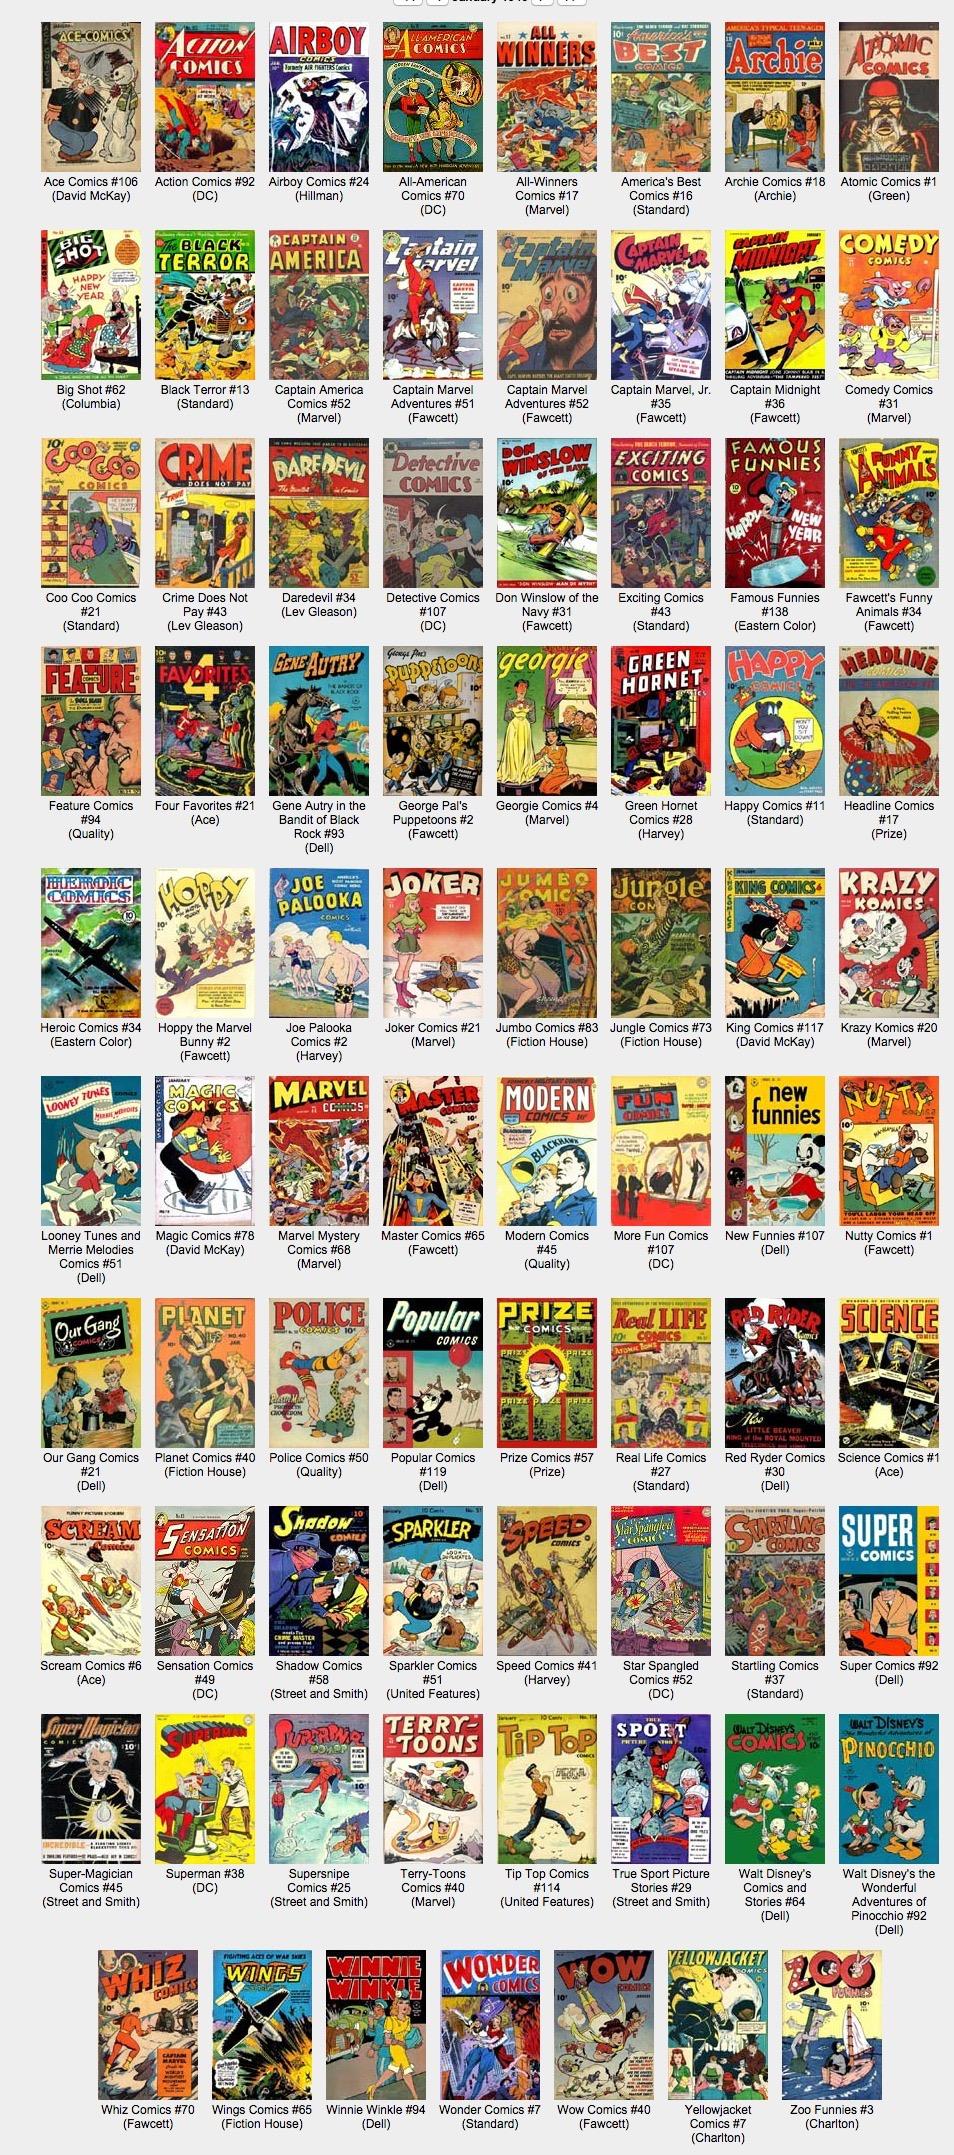 Mike s Amazing World of Comics.jpeg